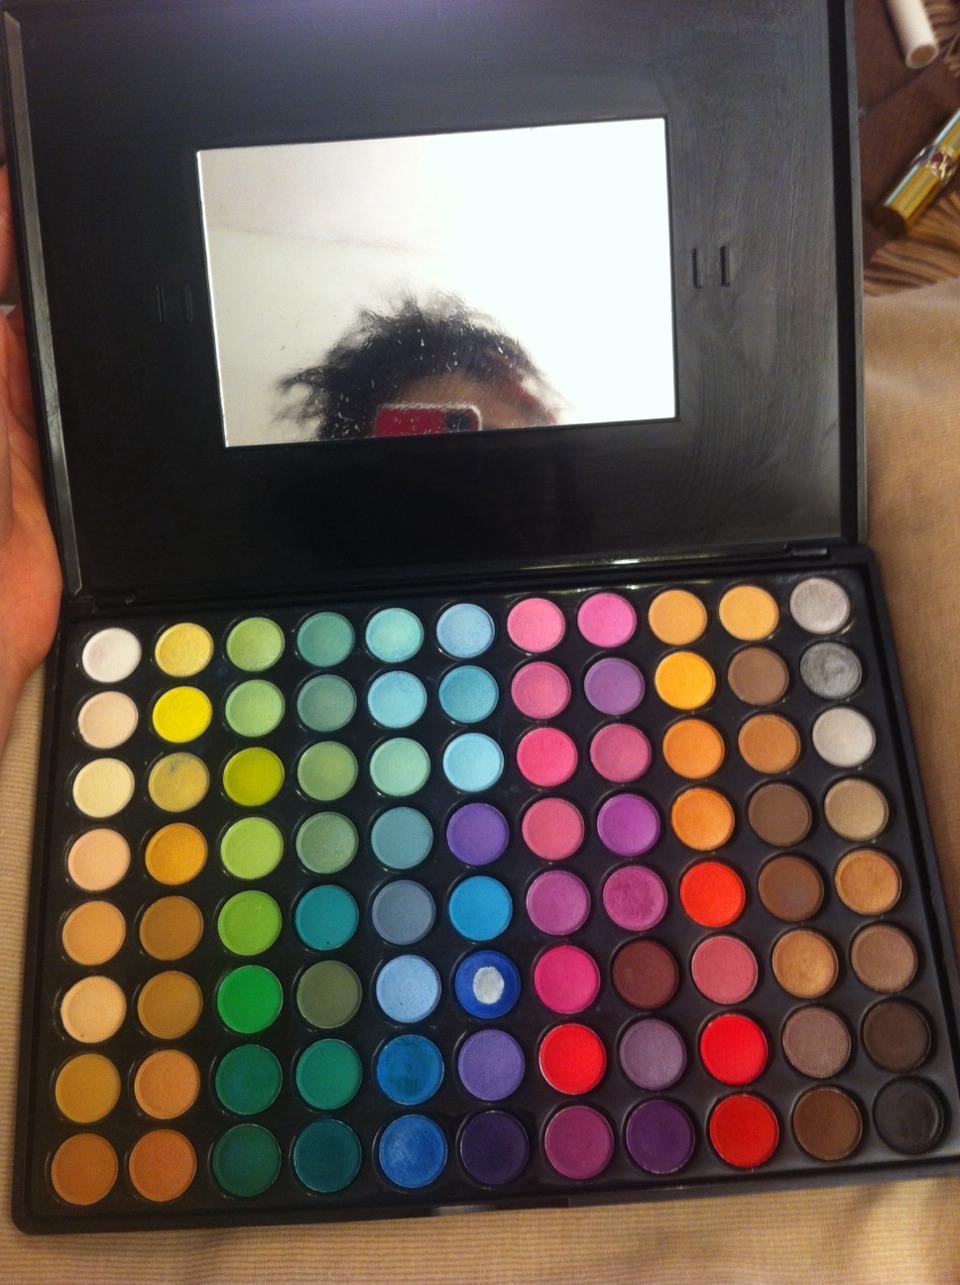 My Fräulein eyeshadow palette was £12 from eBay and works wonders